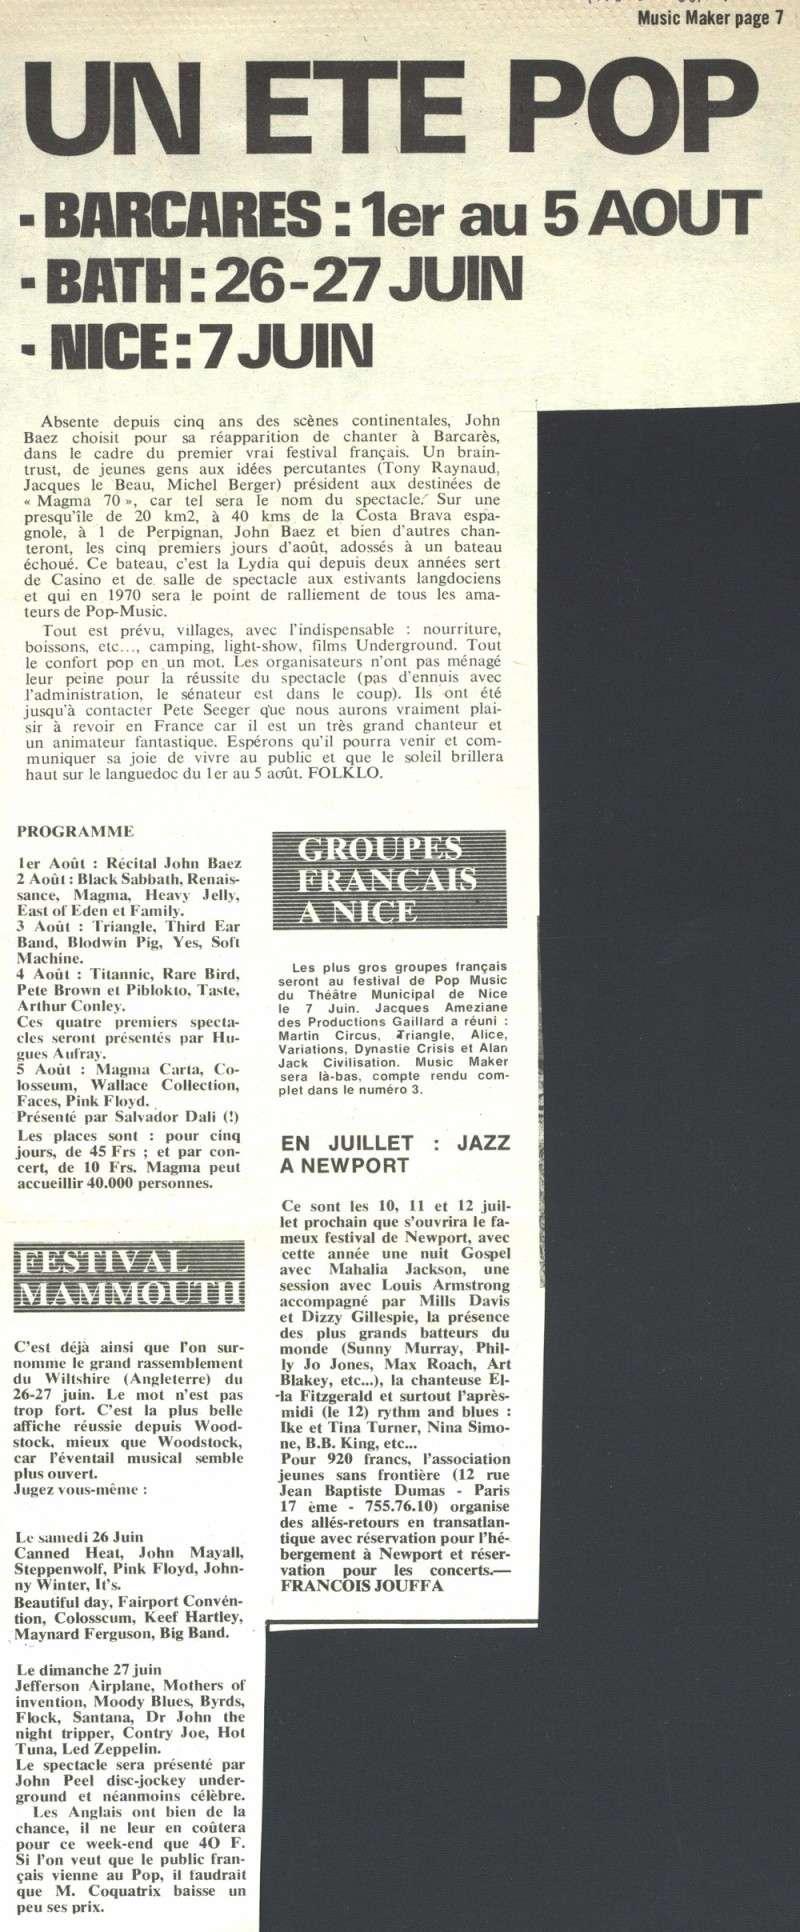 Barcarès, France, 4 août 1970 Taste_17